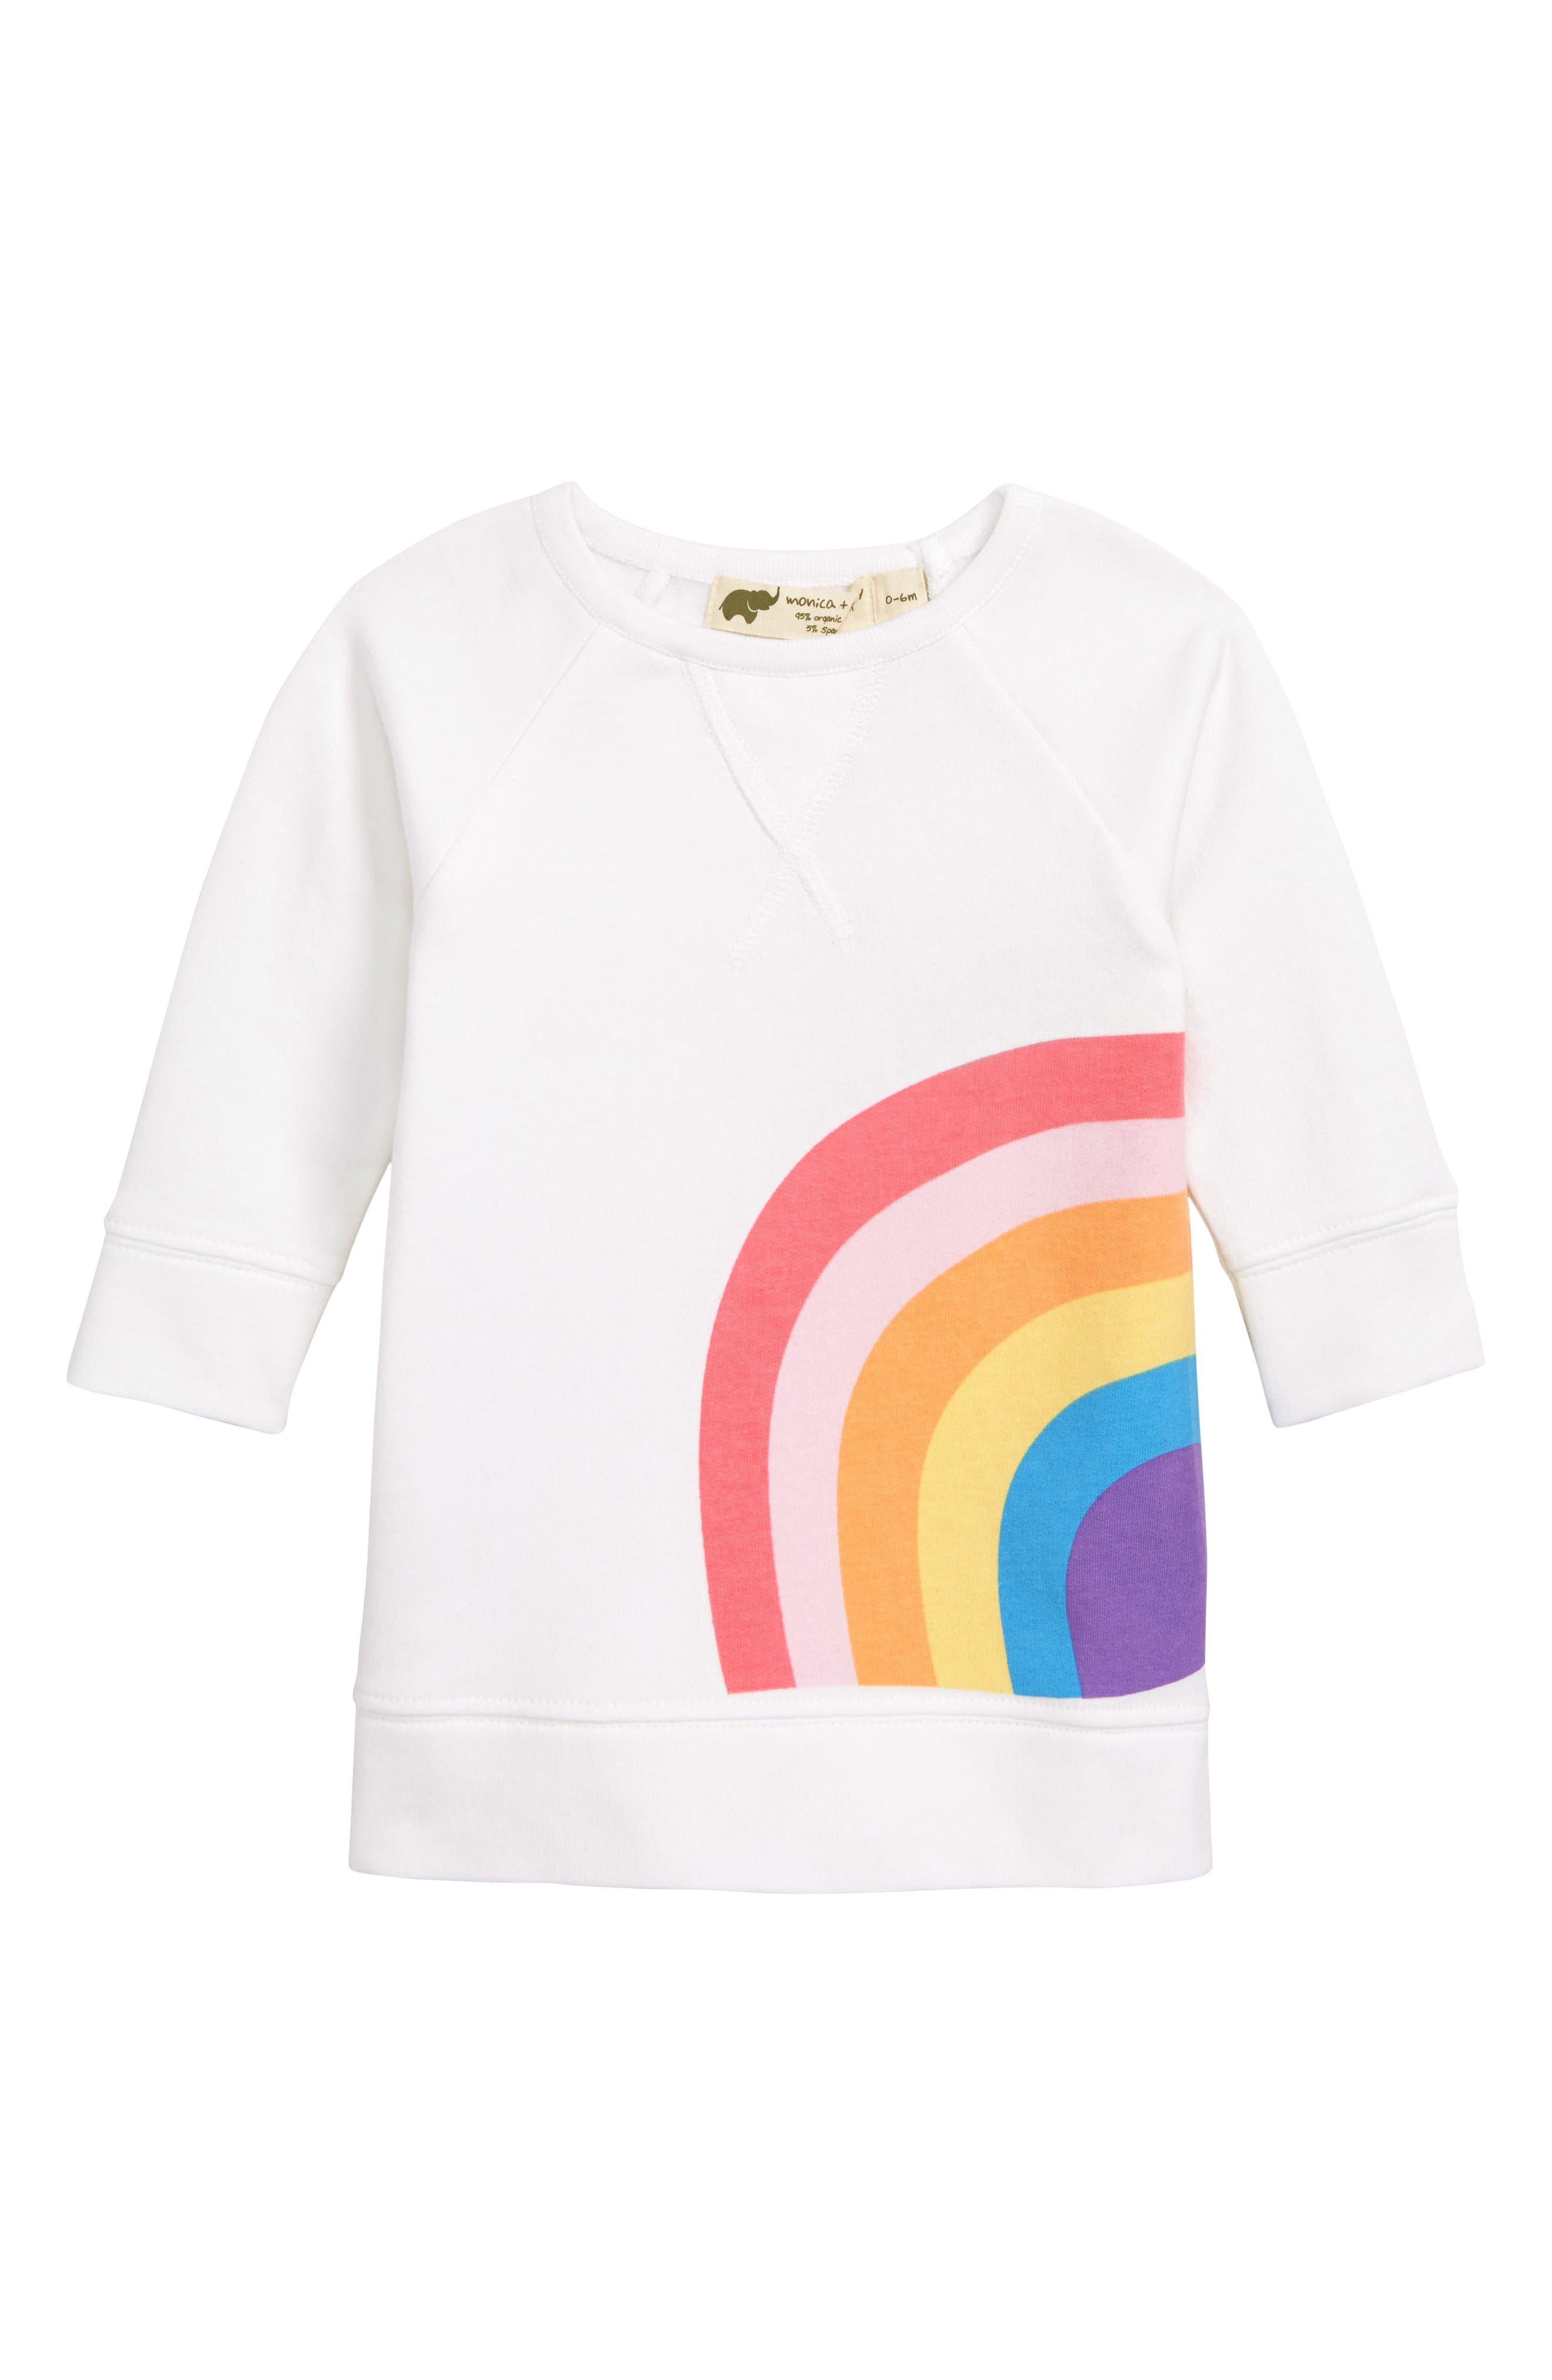 MONICA + ANDY Varsity Sweatshirt Dress, Main, color, 100